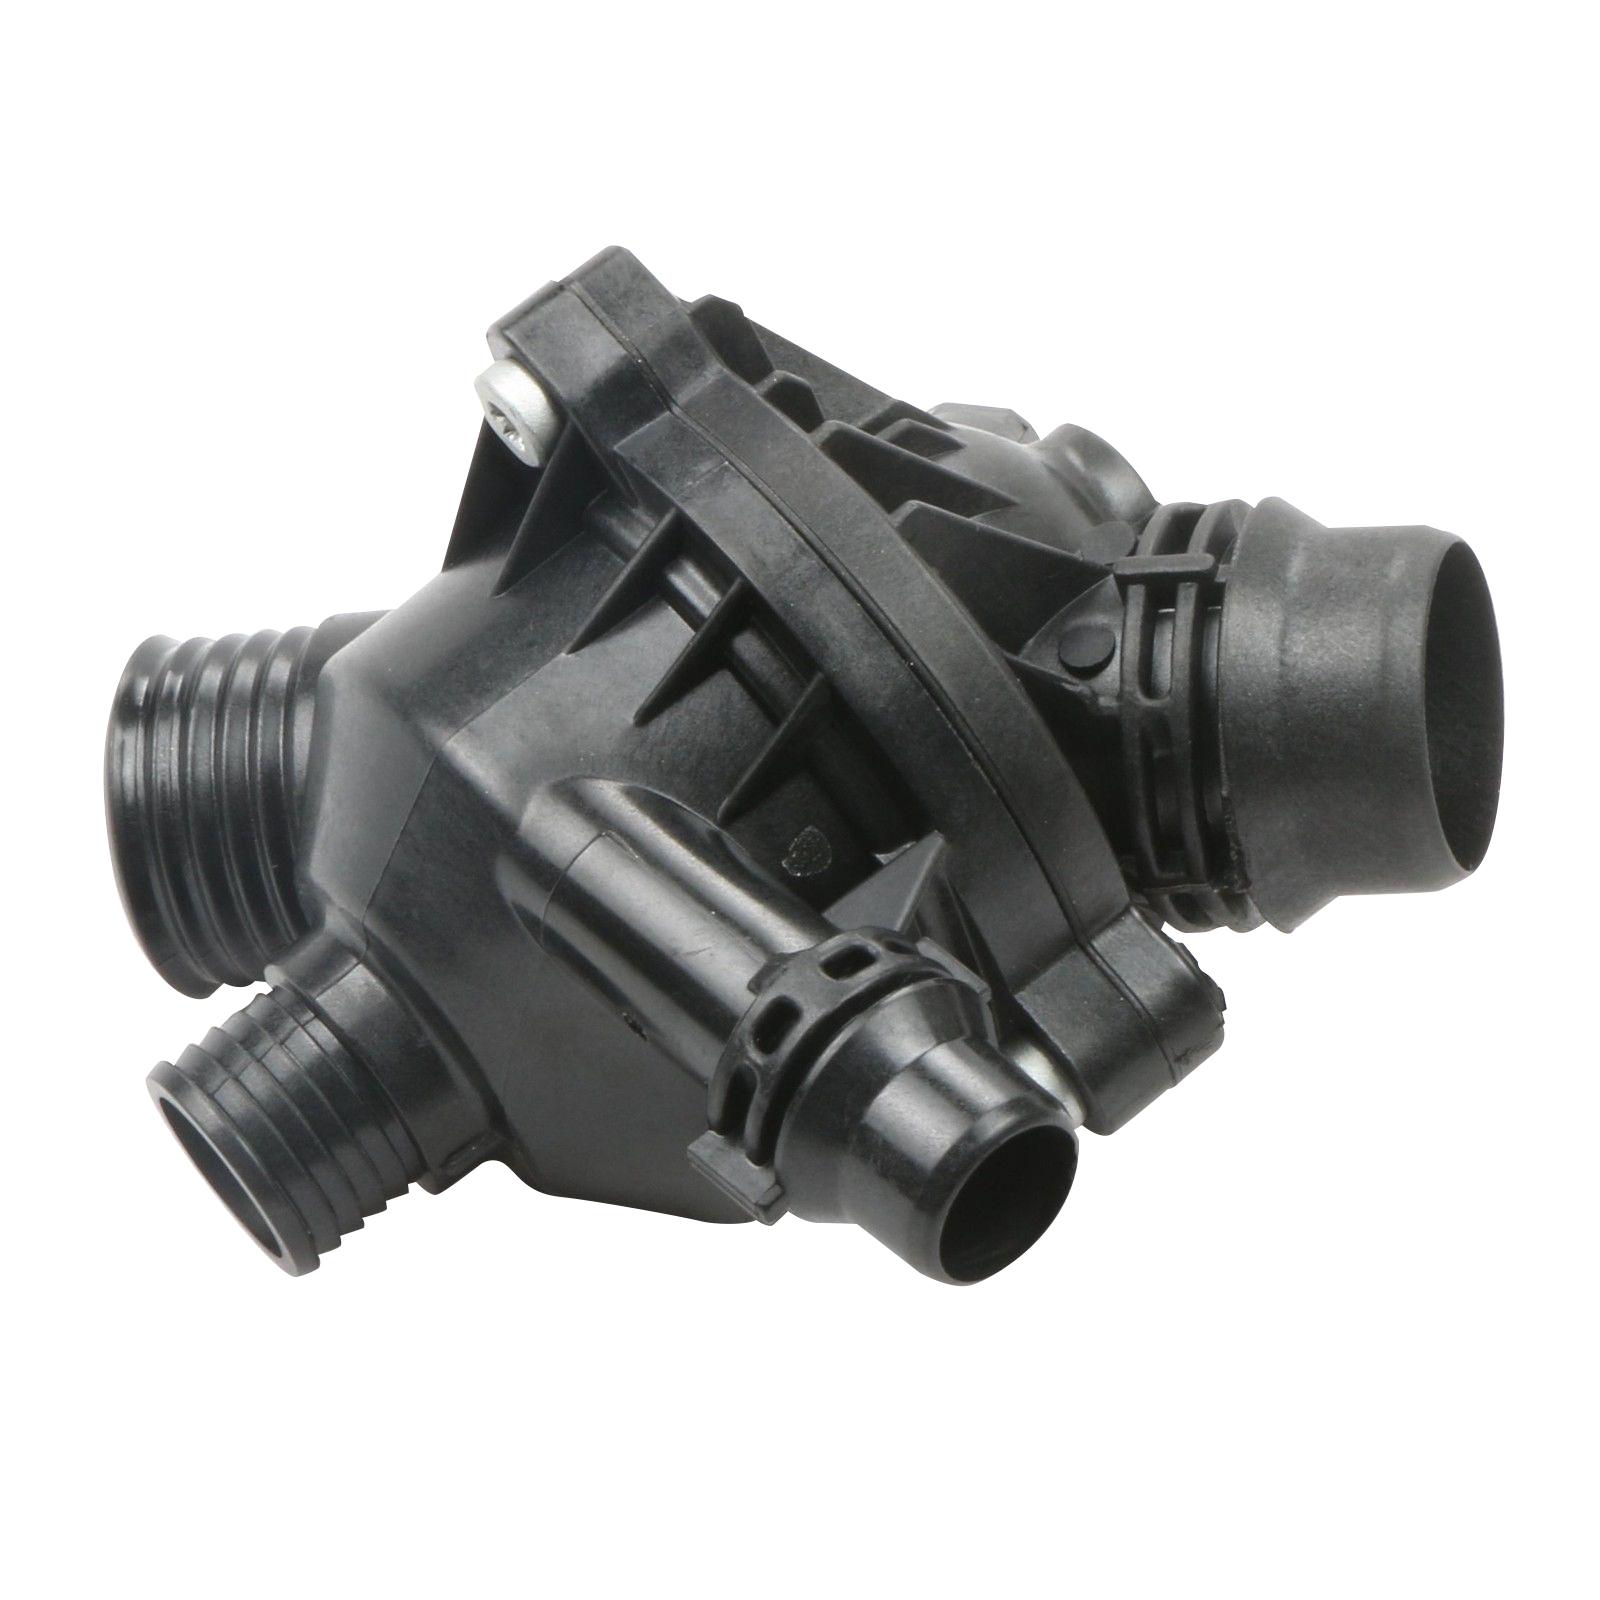 Bmw Xdrive Problems: Water Pump W/Thermostat &Bolt 11517586925 For BMW 128i